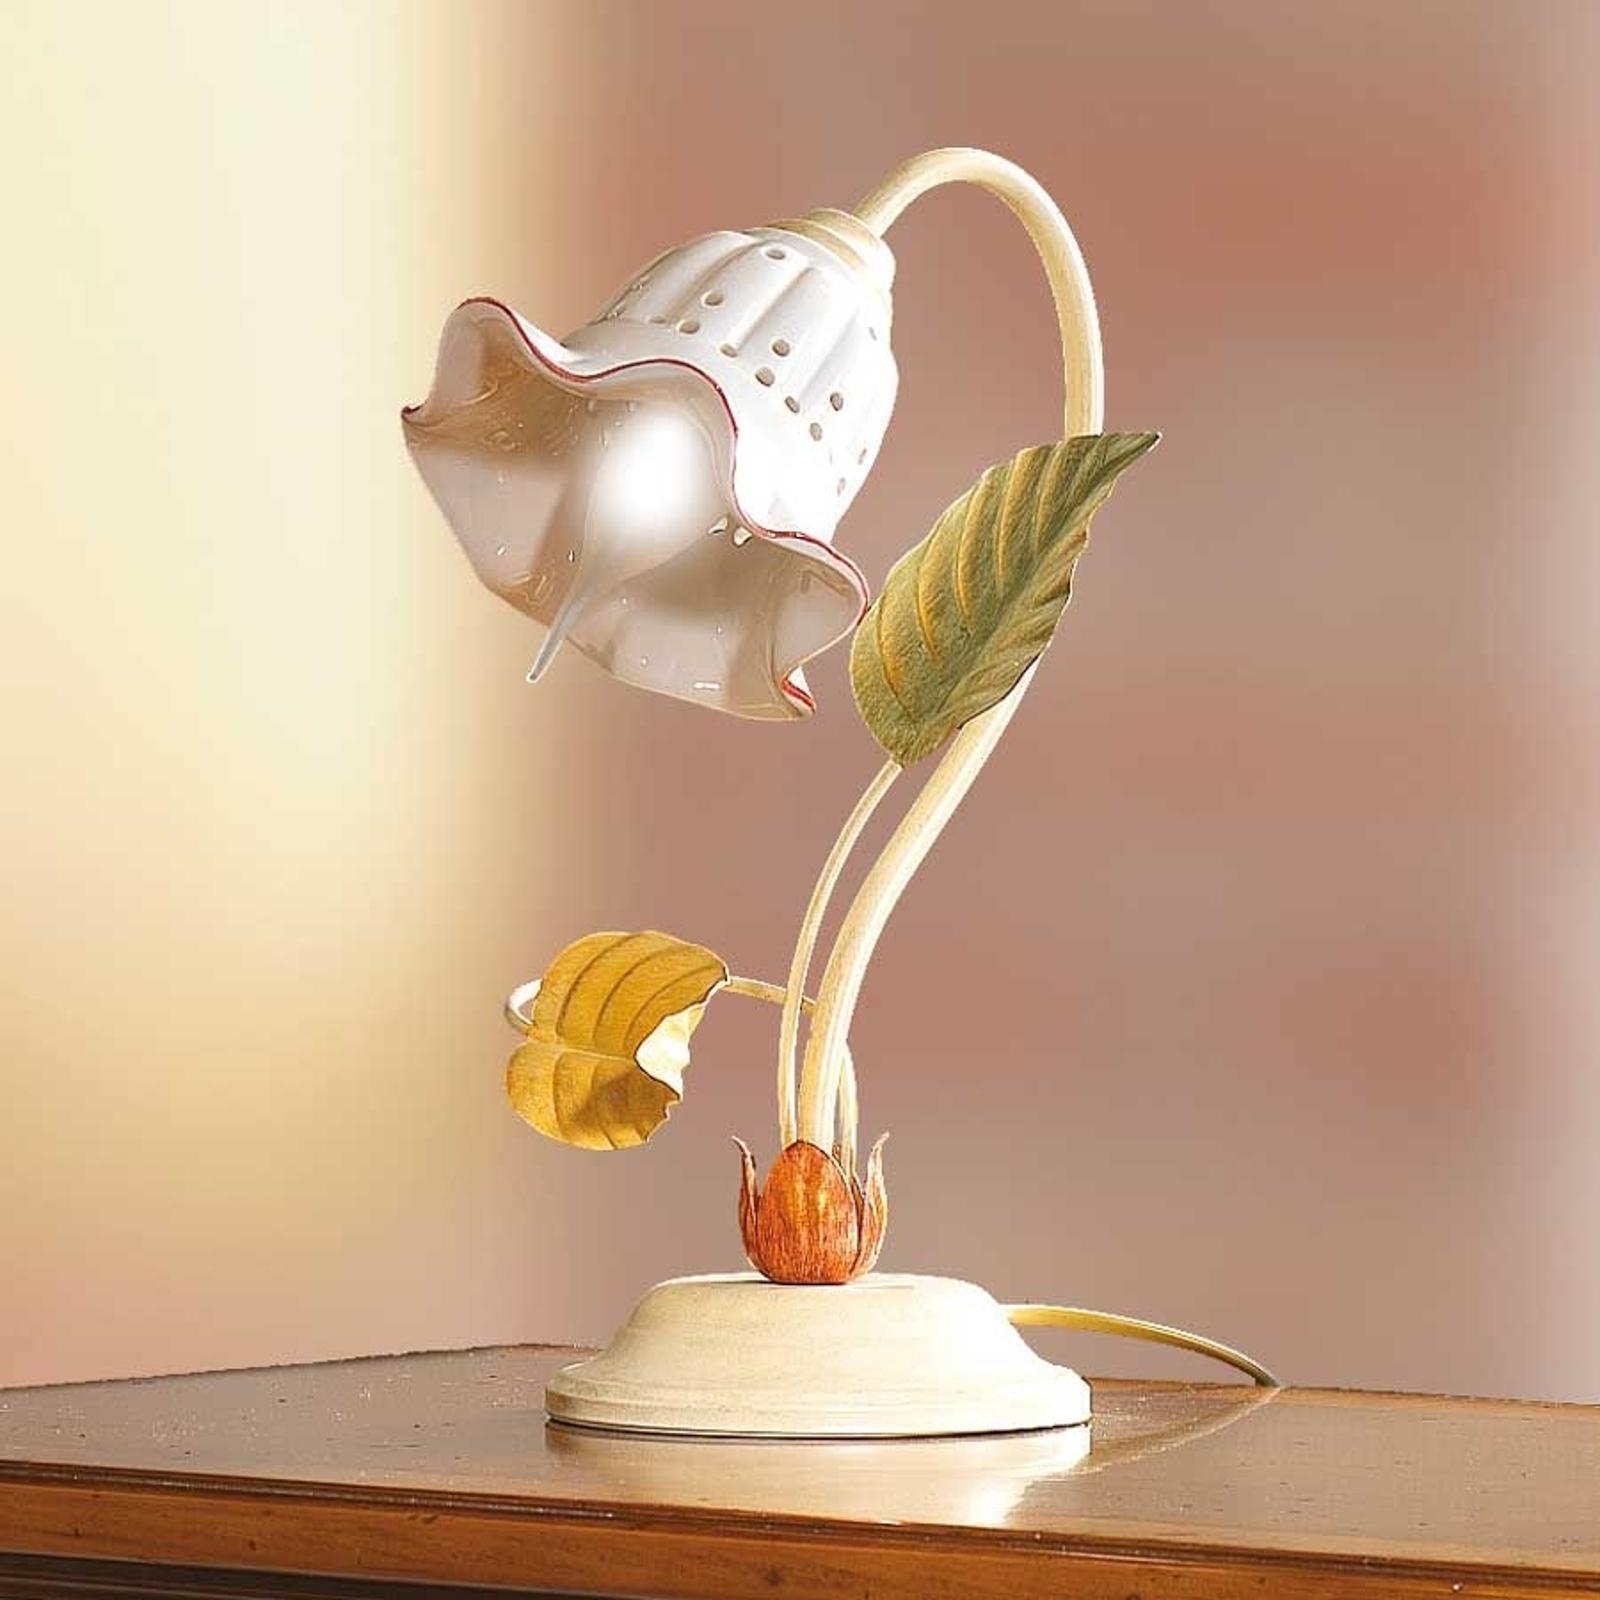 Lampe à poser GIADE de style florentin